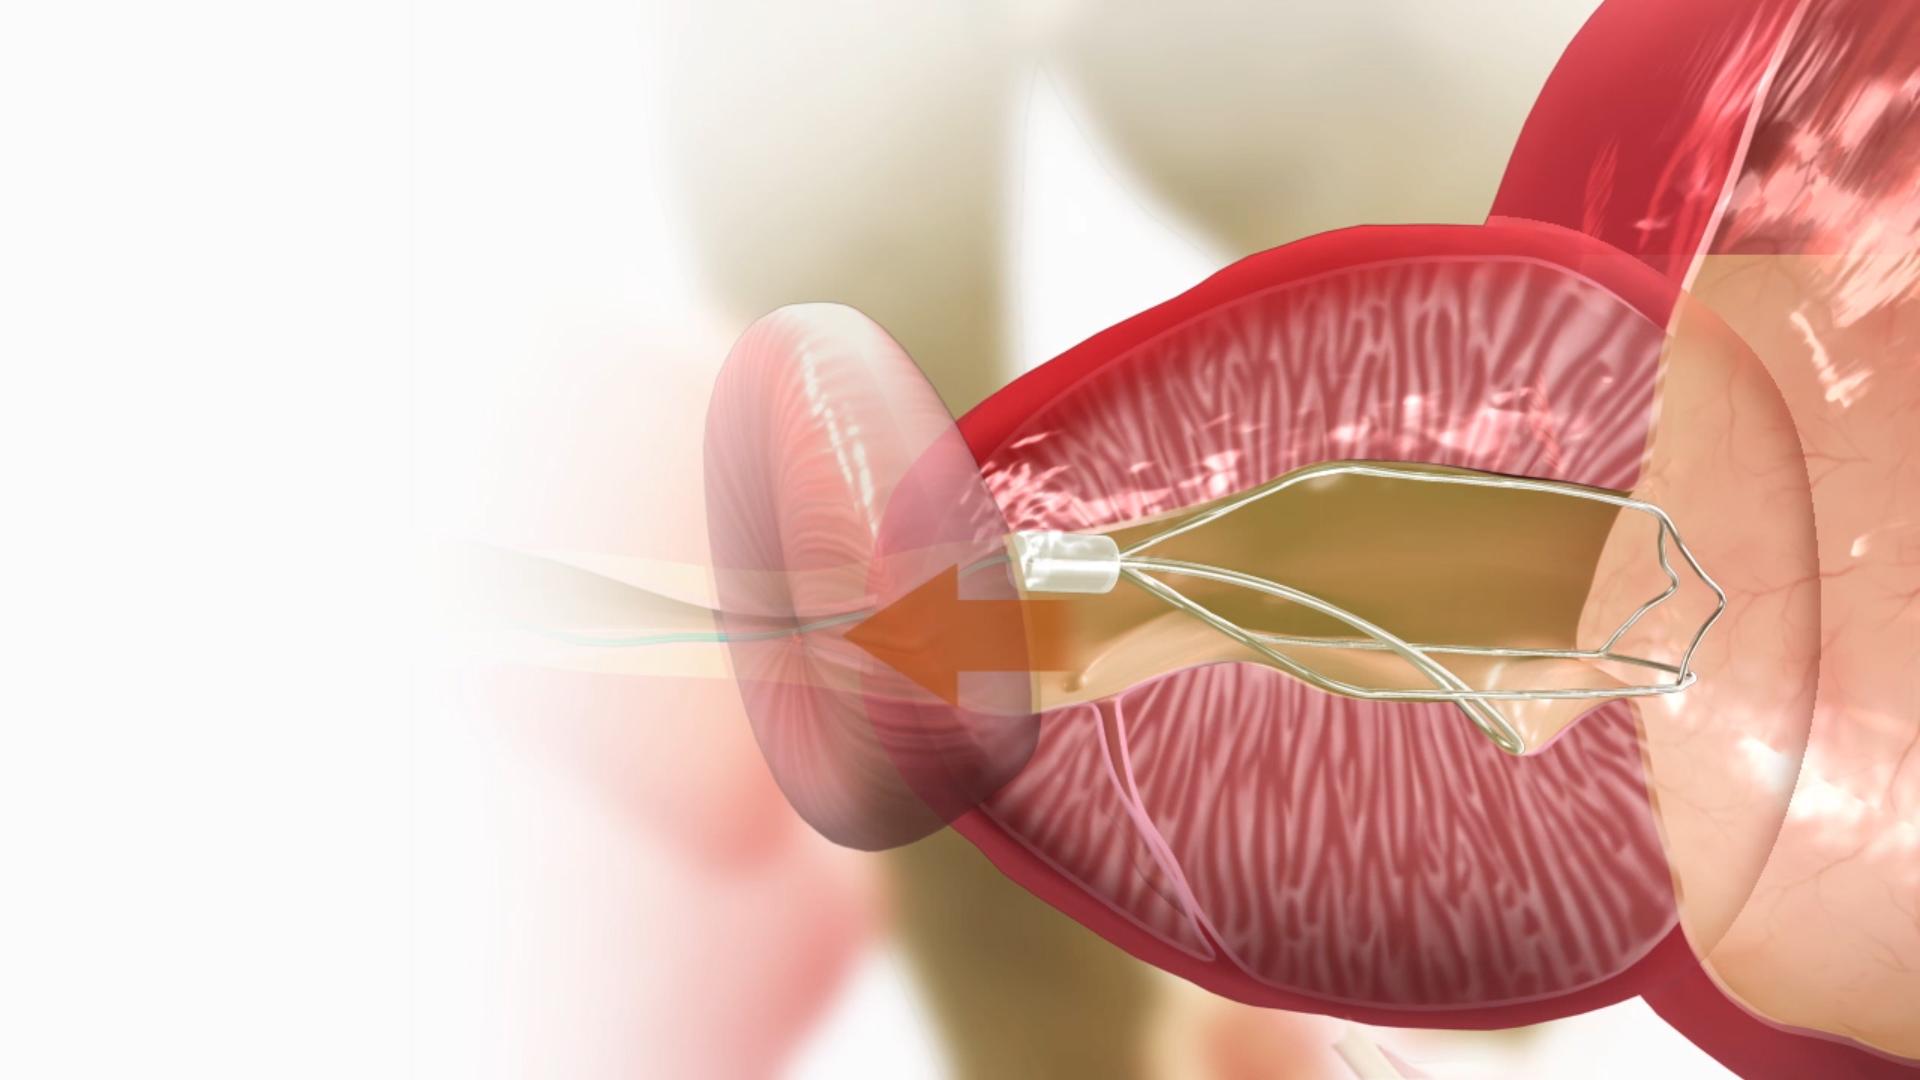 tratamiento próstata I / tind / stent